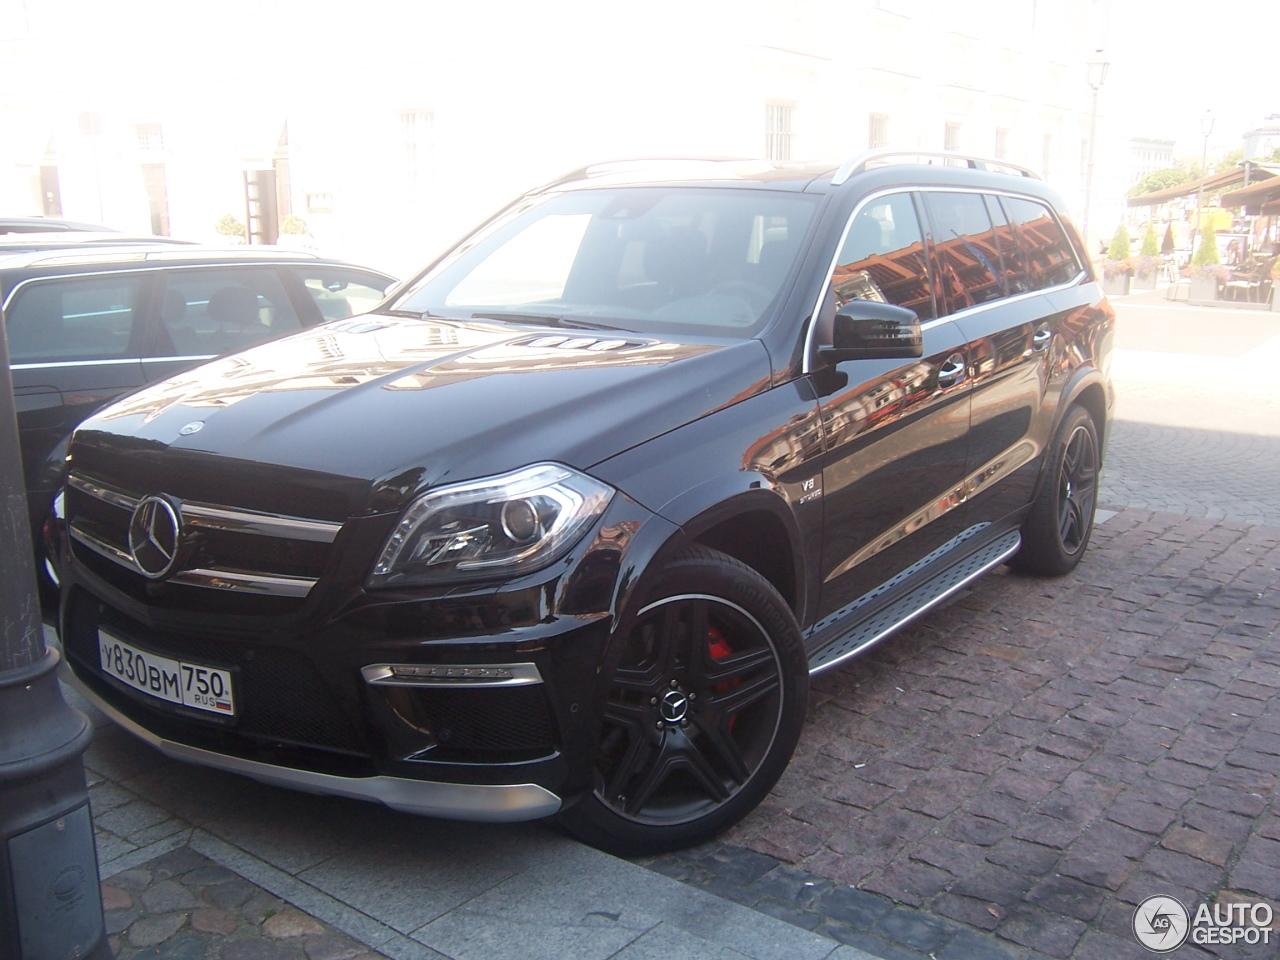 Mercedes benz gl 63 amg x166 7 august 2015 autogespot for Mercedes benz gl amg 2015